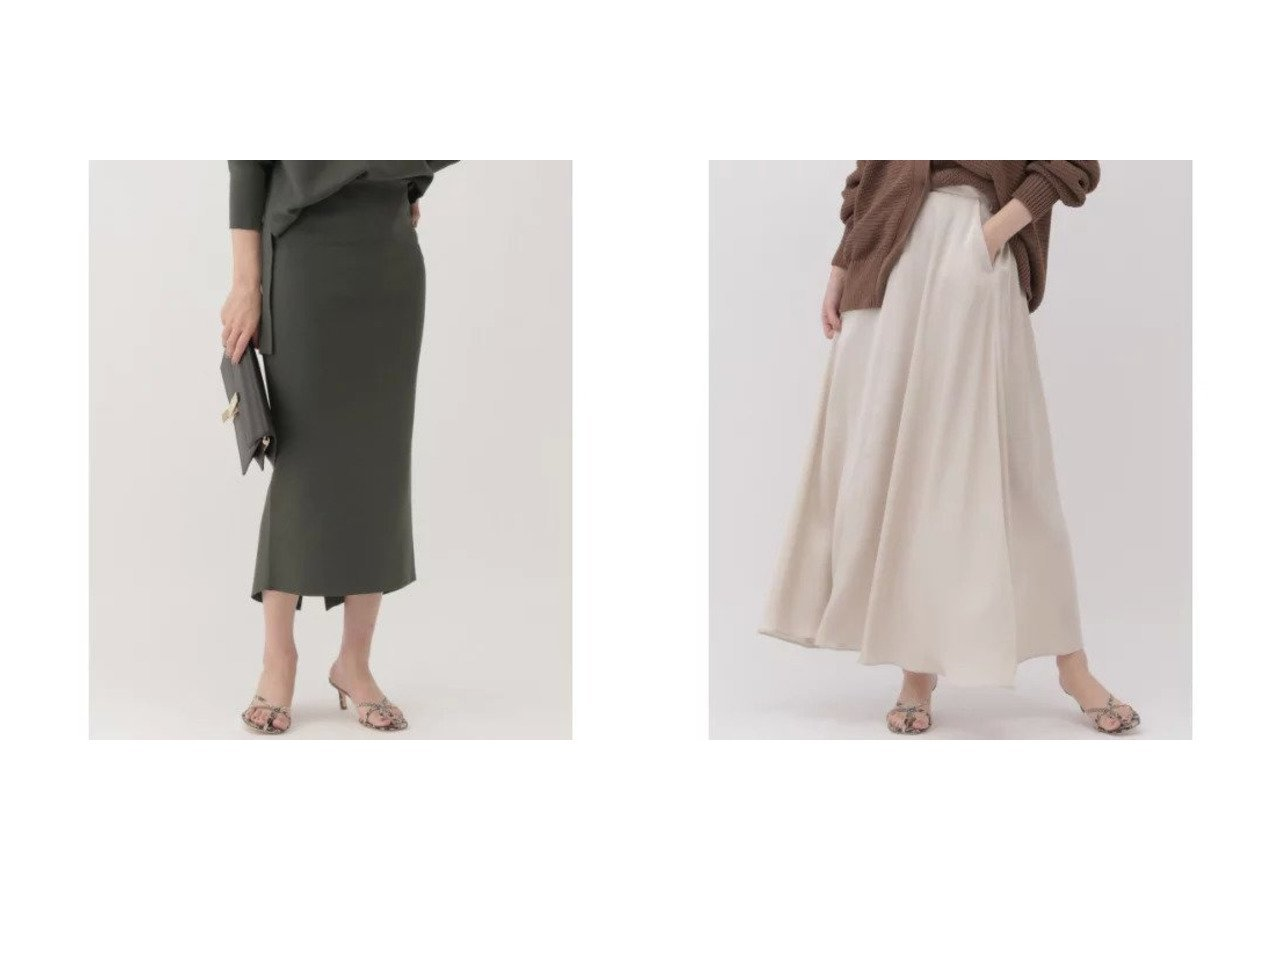 【Chaos/カオス】のシルクコンミラノリブタイトスカート&ジュールサテンフレアースカート カオスのおすすめ!人気、トレンド・レディースファッションの通販 おすすめで人気の流行・トレンド、ファッションの通販商品 メンズファッション・キッズファッション・インテリア・家具・レディースファッション・服の通販 founy(ファニー) https://founy.com/ ファッション Fashion レディースファッション WOMEN スカート Skirt シルク シンプル パターン マキシ ロング |ID:crp329100000020653